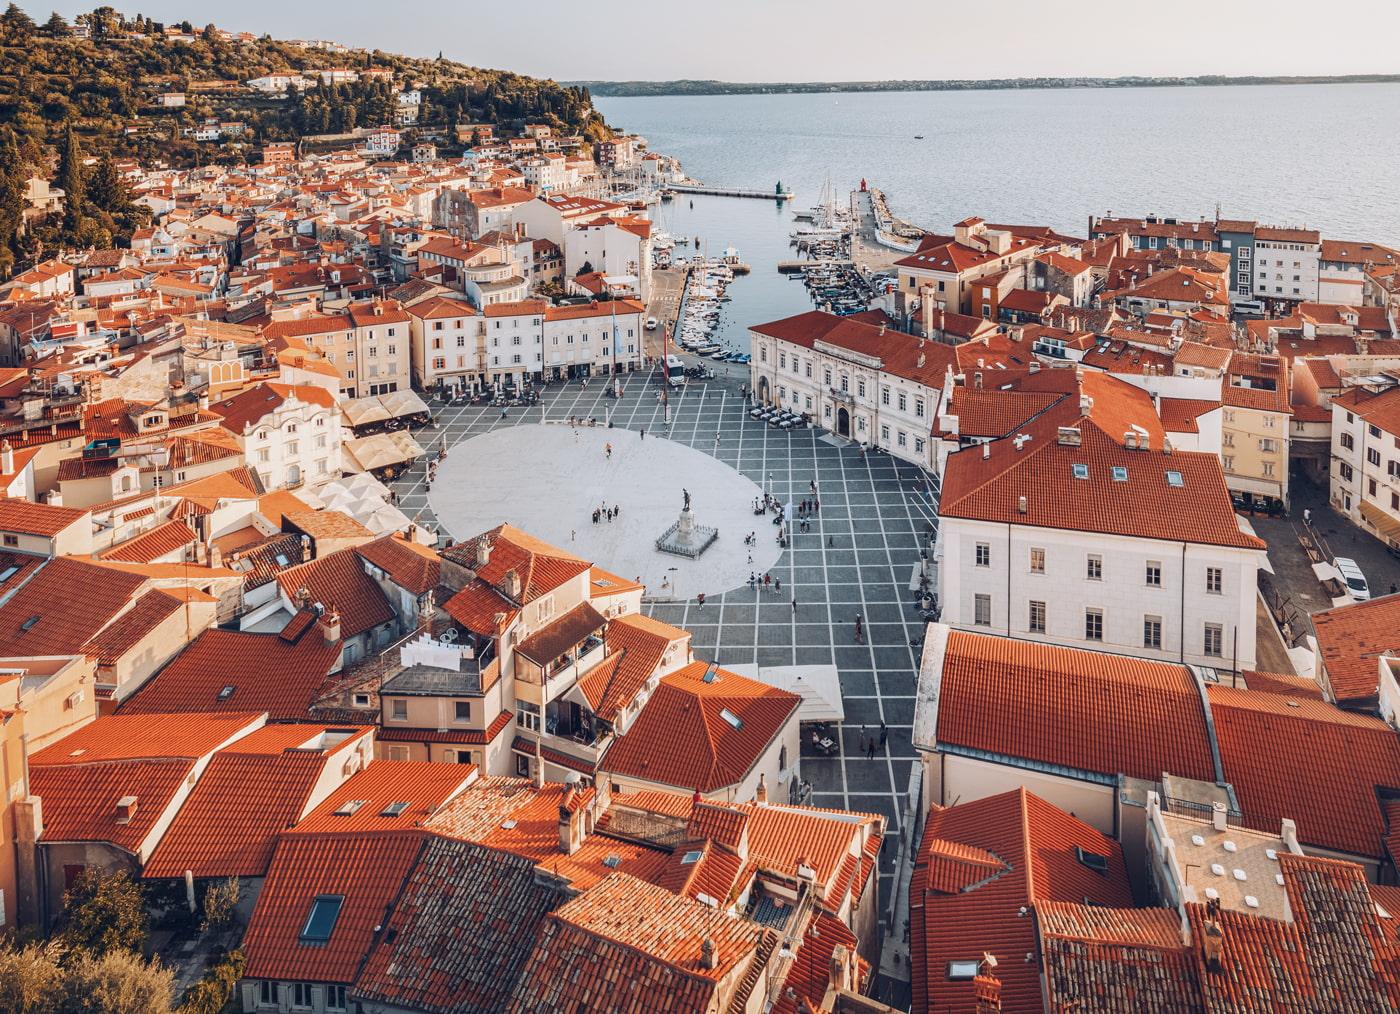 Piran town in Slovenia